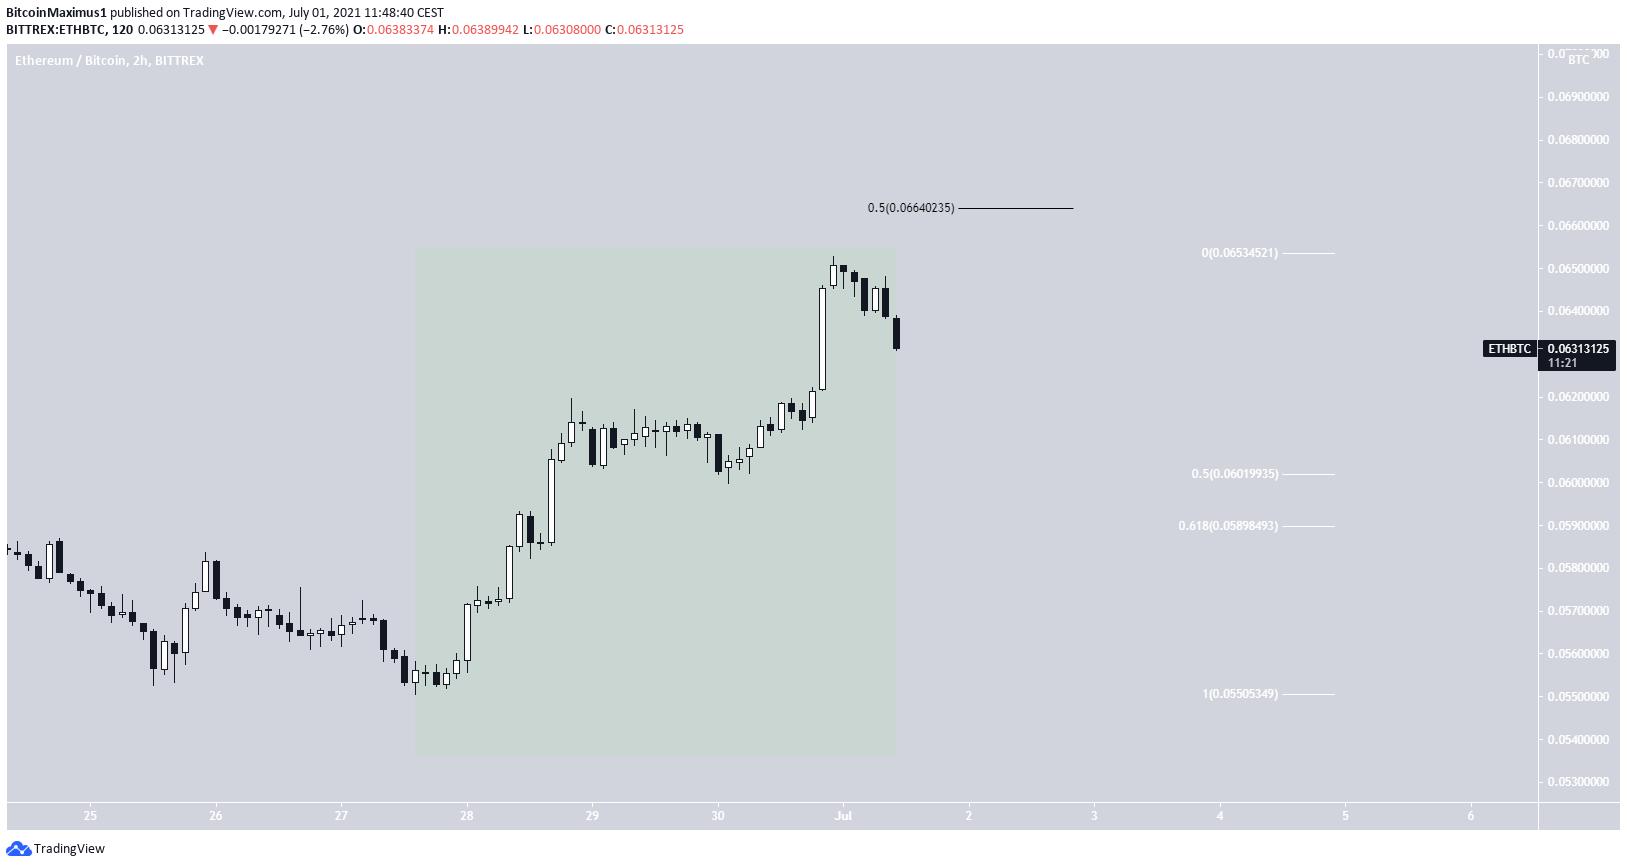 ETH/BTC short-term